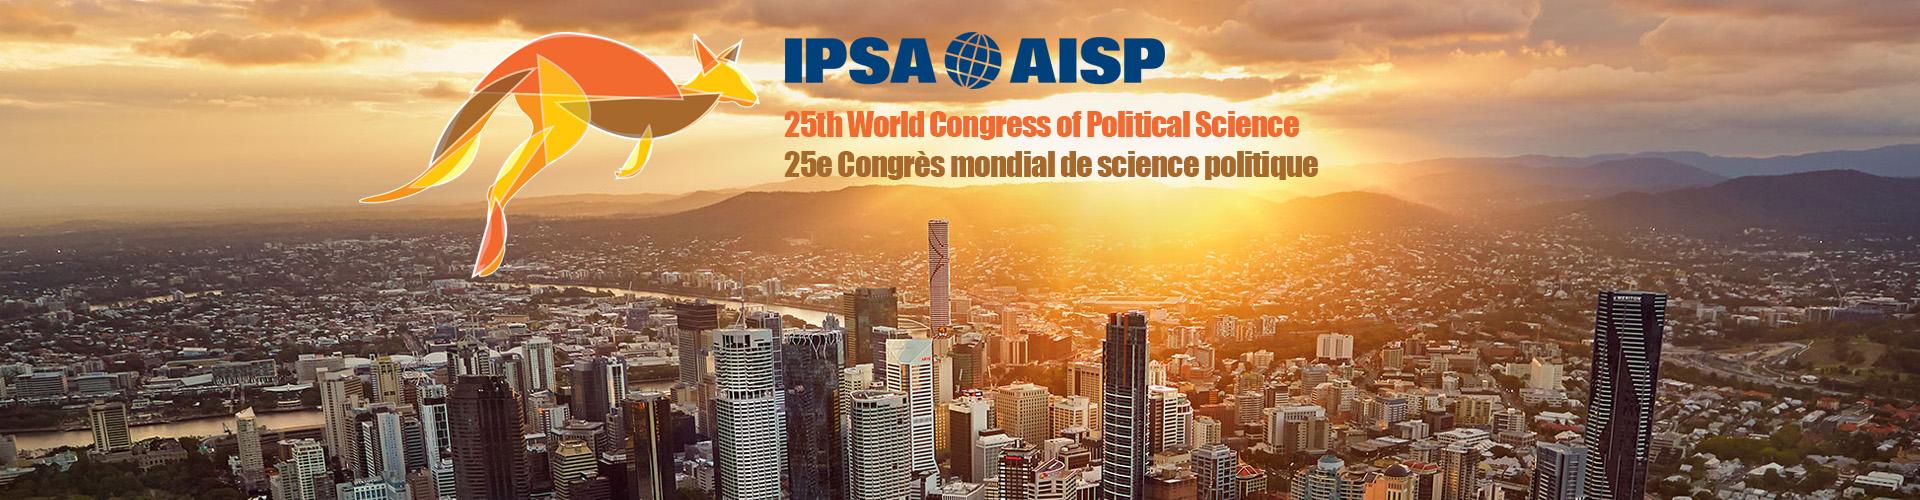 Political Science News - News | IPSA